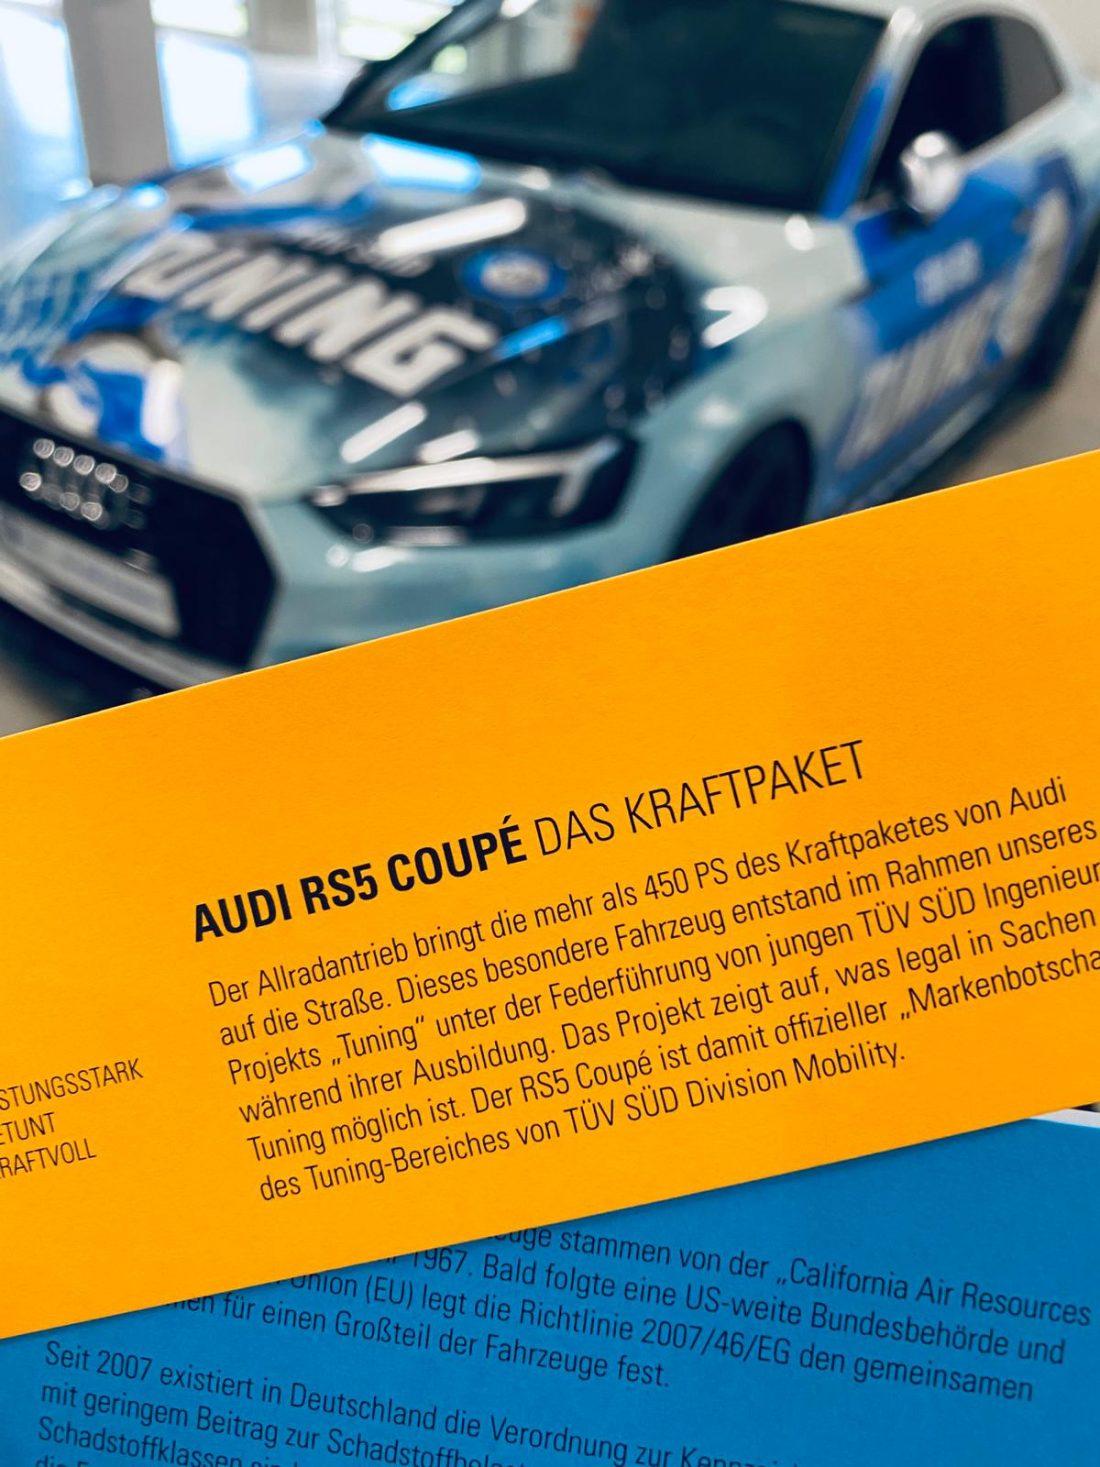 MAZ-Broschüre6 tuev sued faecher |creo-media GmbH Hannover